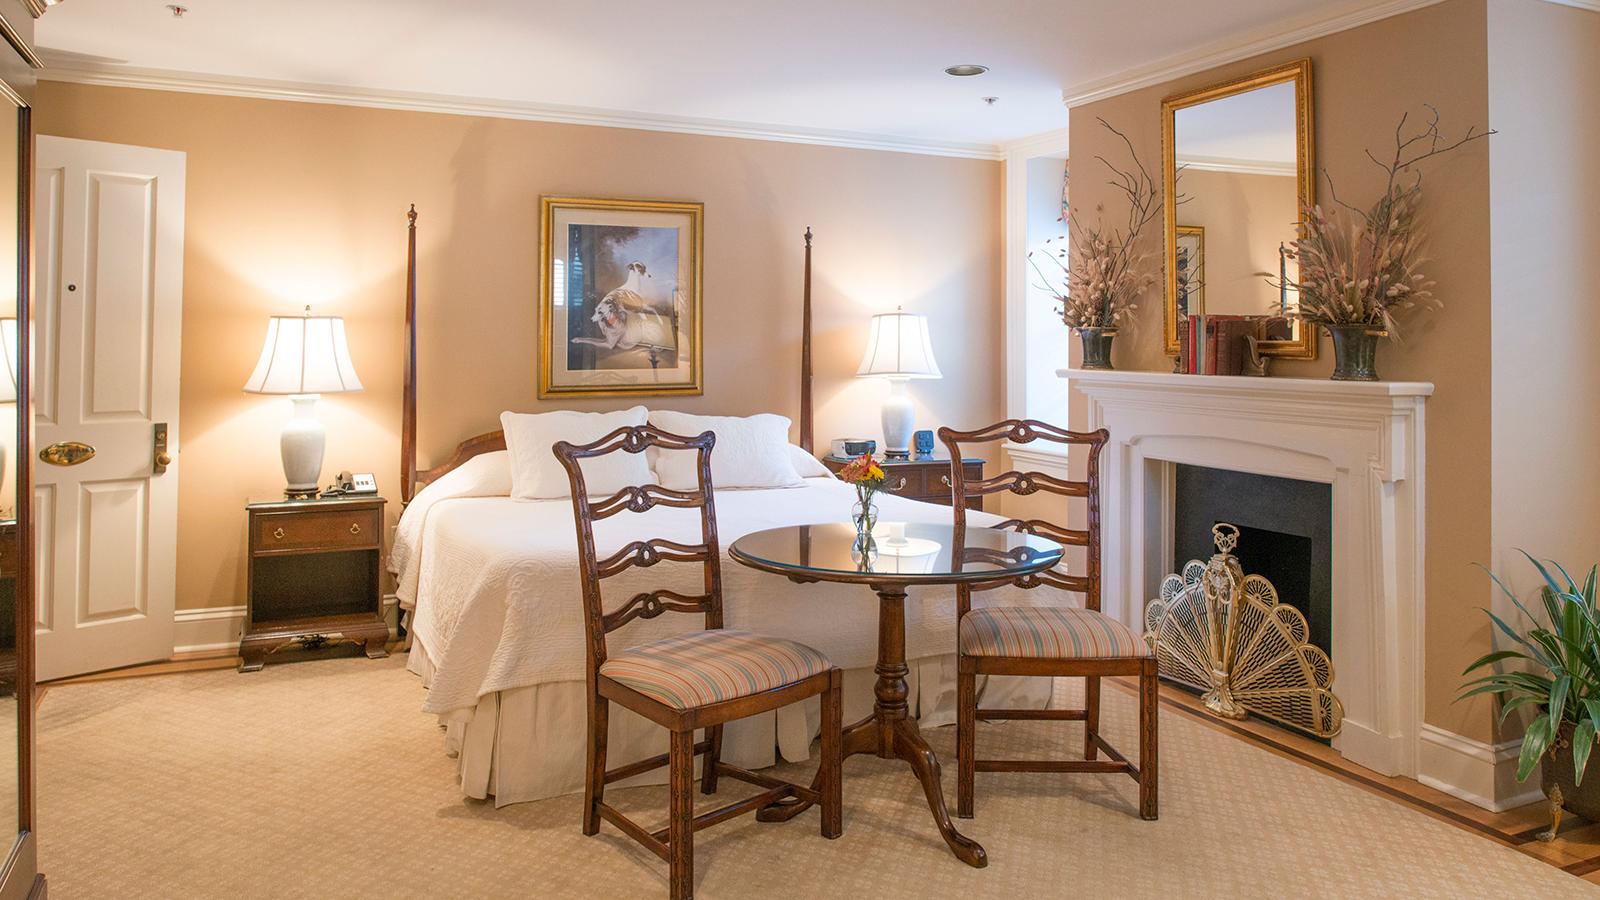 Image of Guestroom Interior, John Rutledge House Inn in Charleston, South Carolina, 1763, Member of Historic Hotels of America, Accommodations